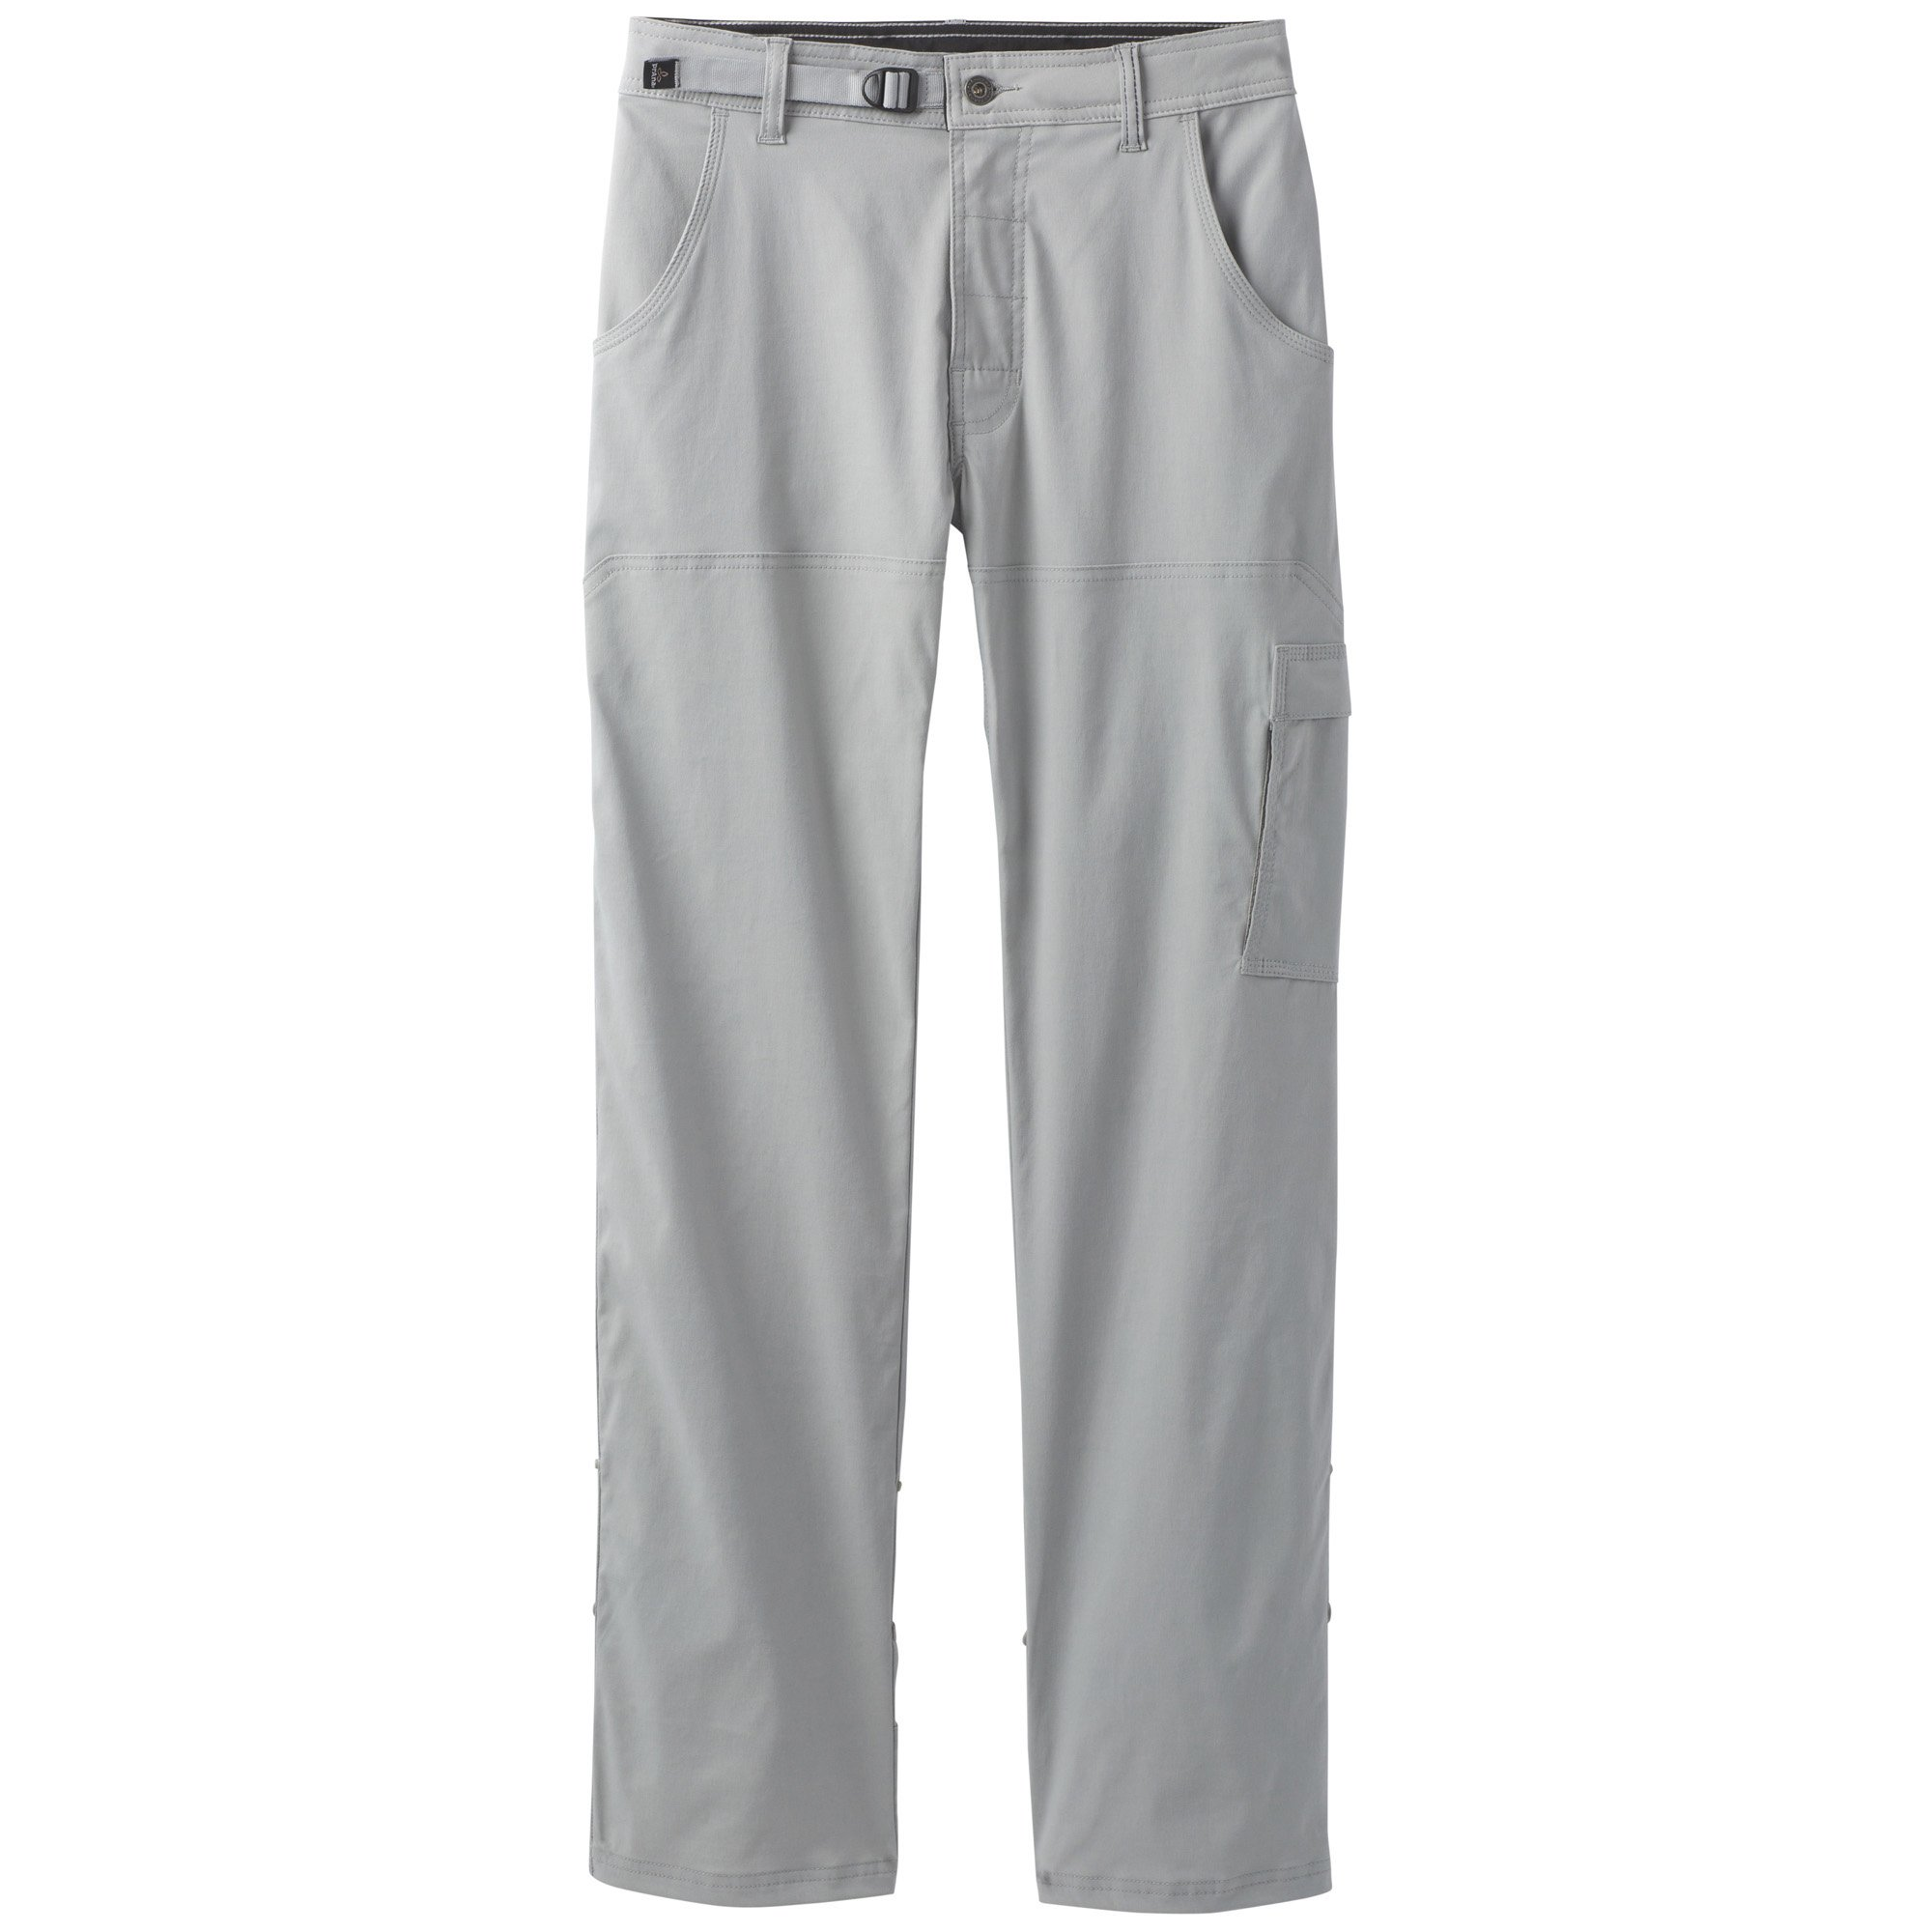 prAna Men's Stretch Zion Inseam Pants, Grey, Size 33